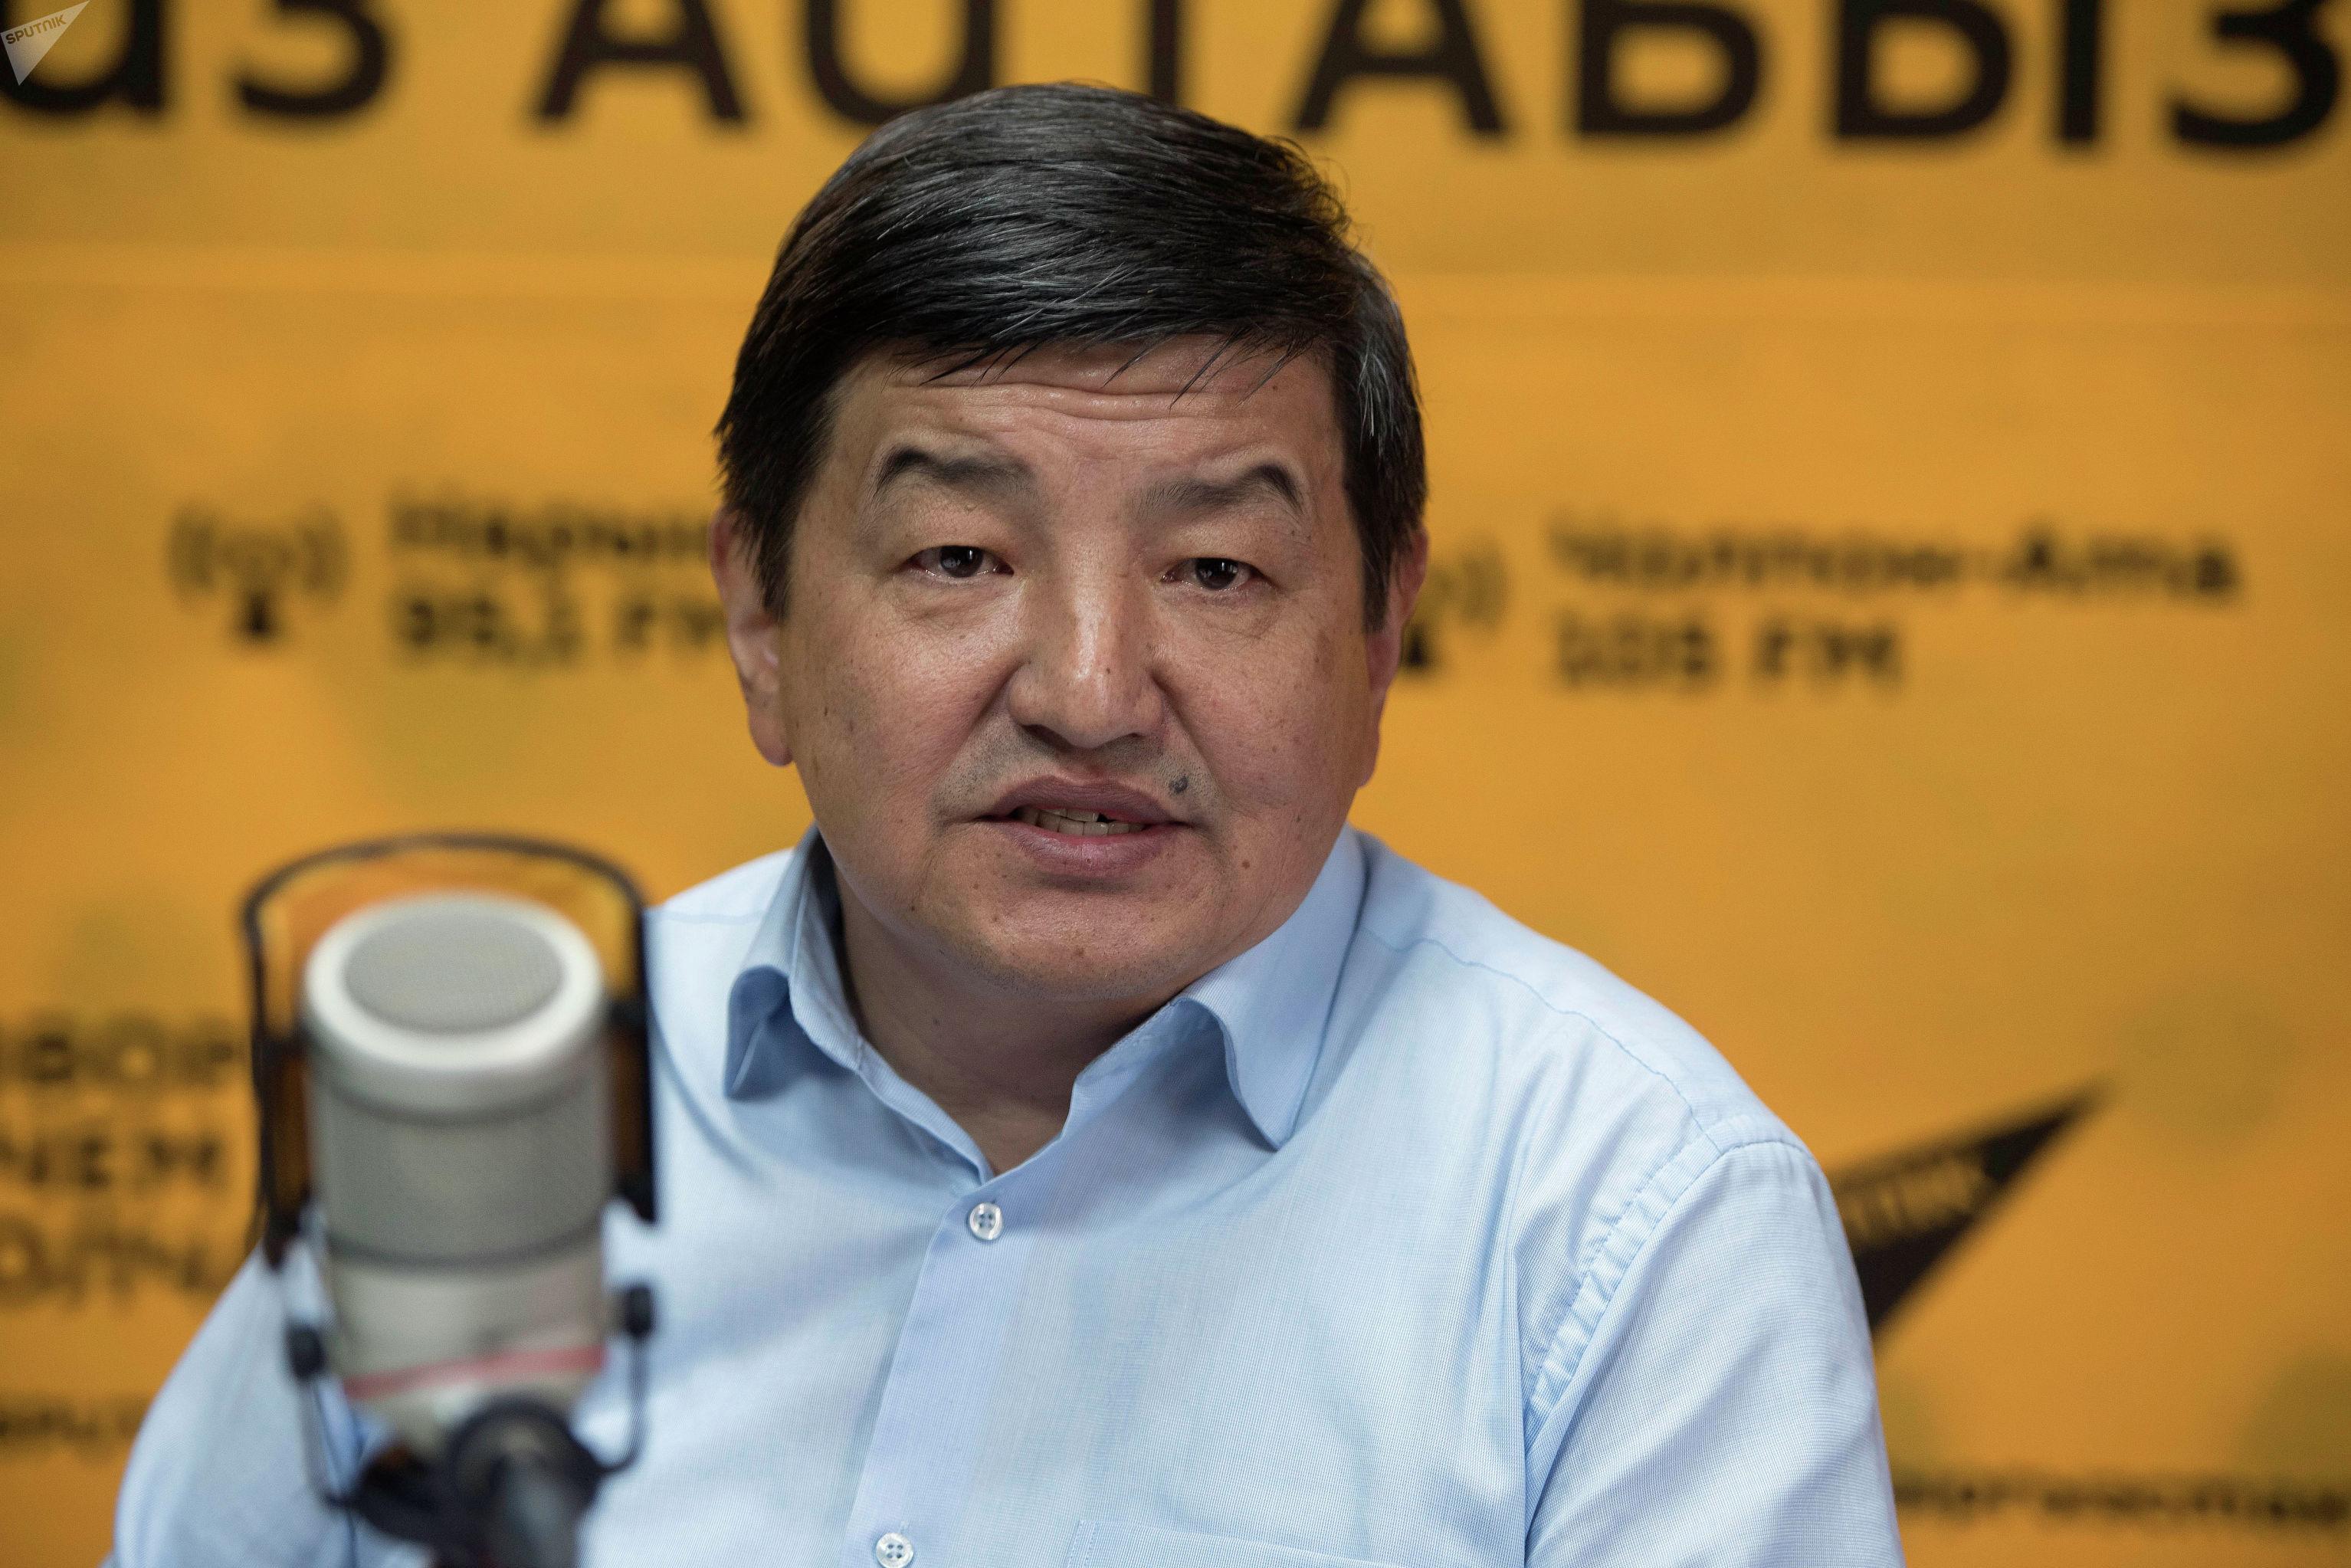 Депутат Жогорку Кенеша от фракции Бир Бол, экономист Акылбек Жапаров во время беседы на радио Sputnik Кыргызстан